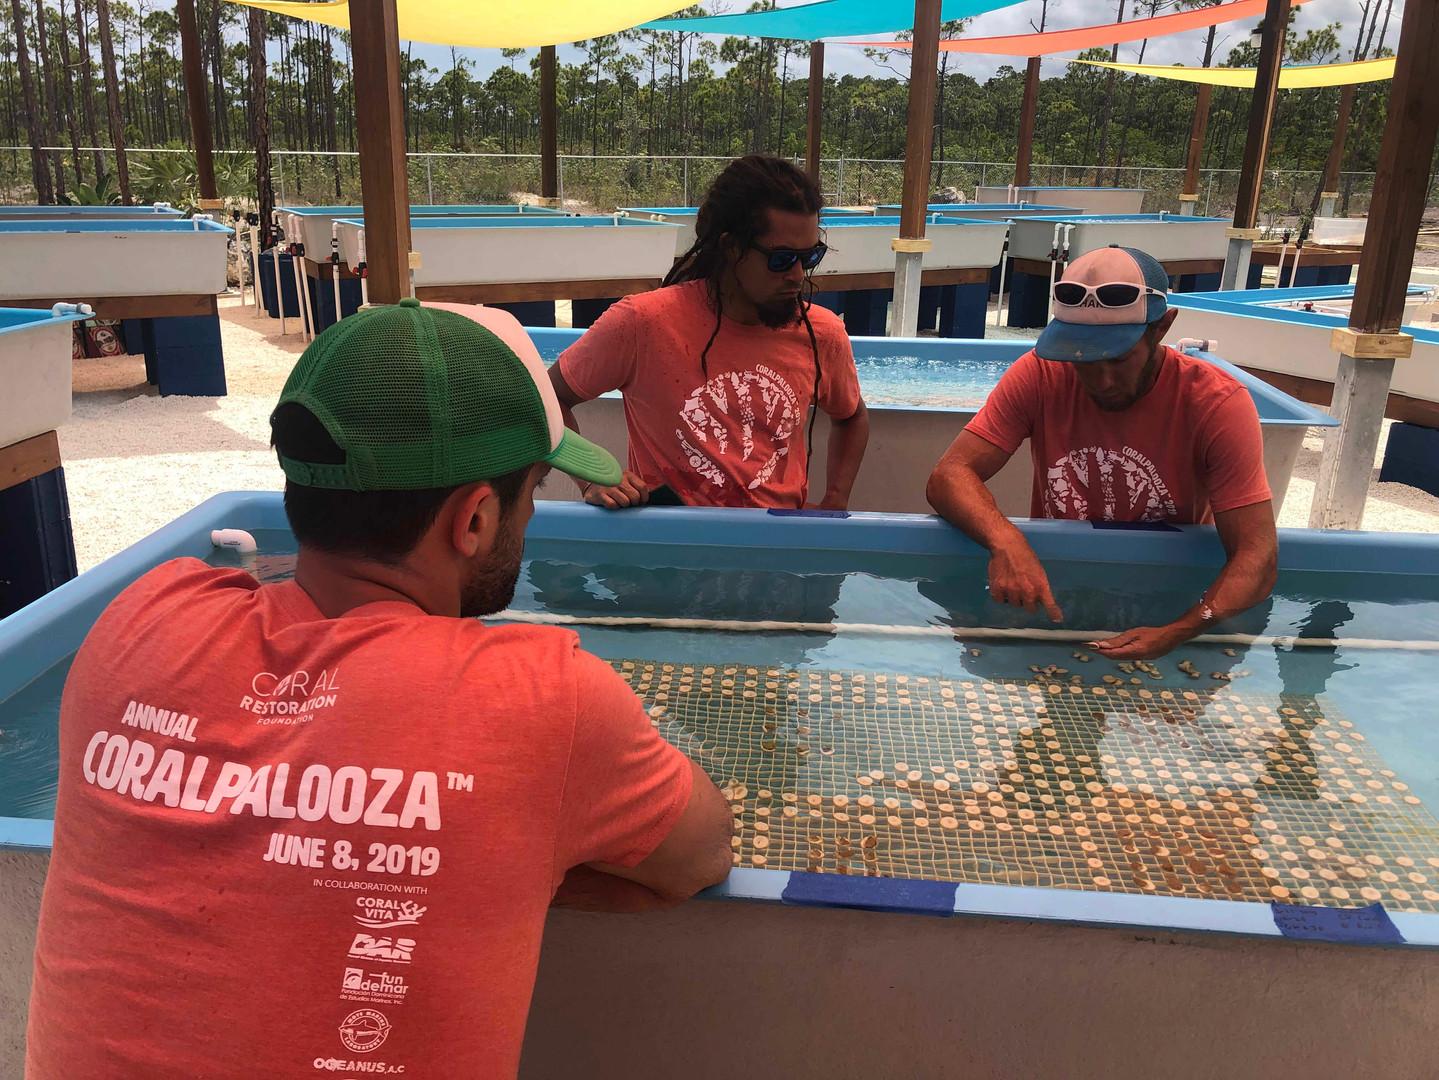 Coralpalooza™_2019_Coral_Vita_075.JPG